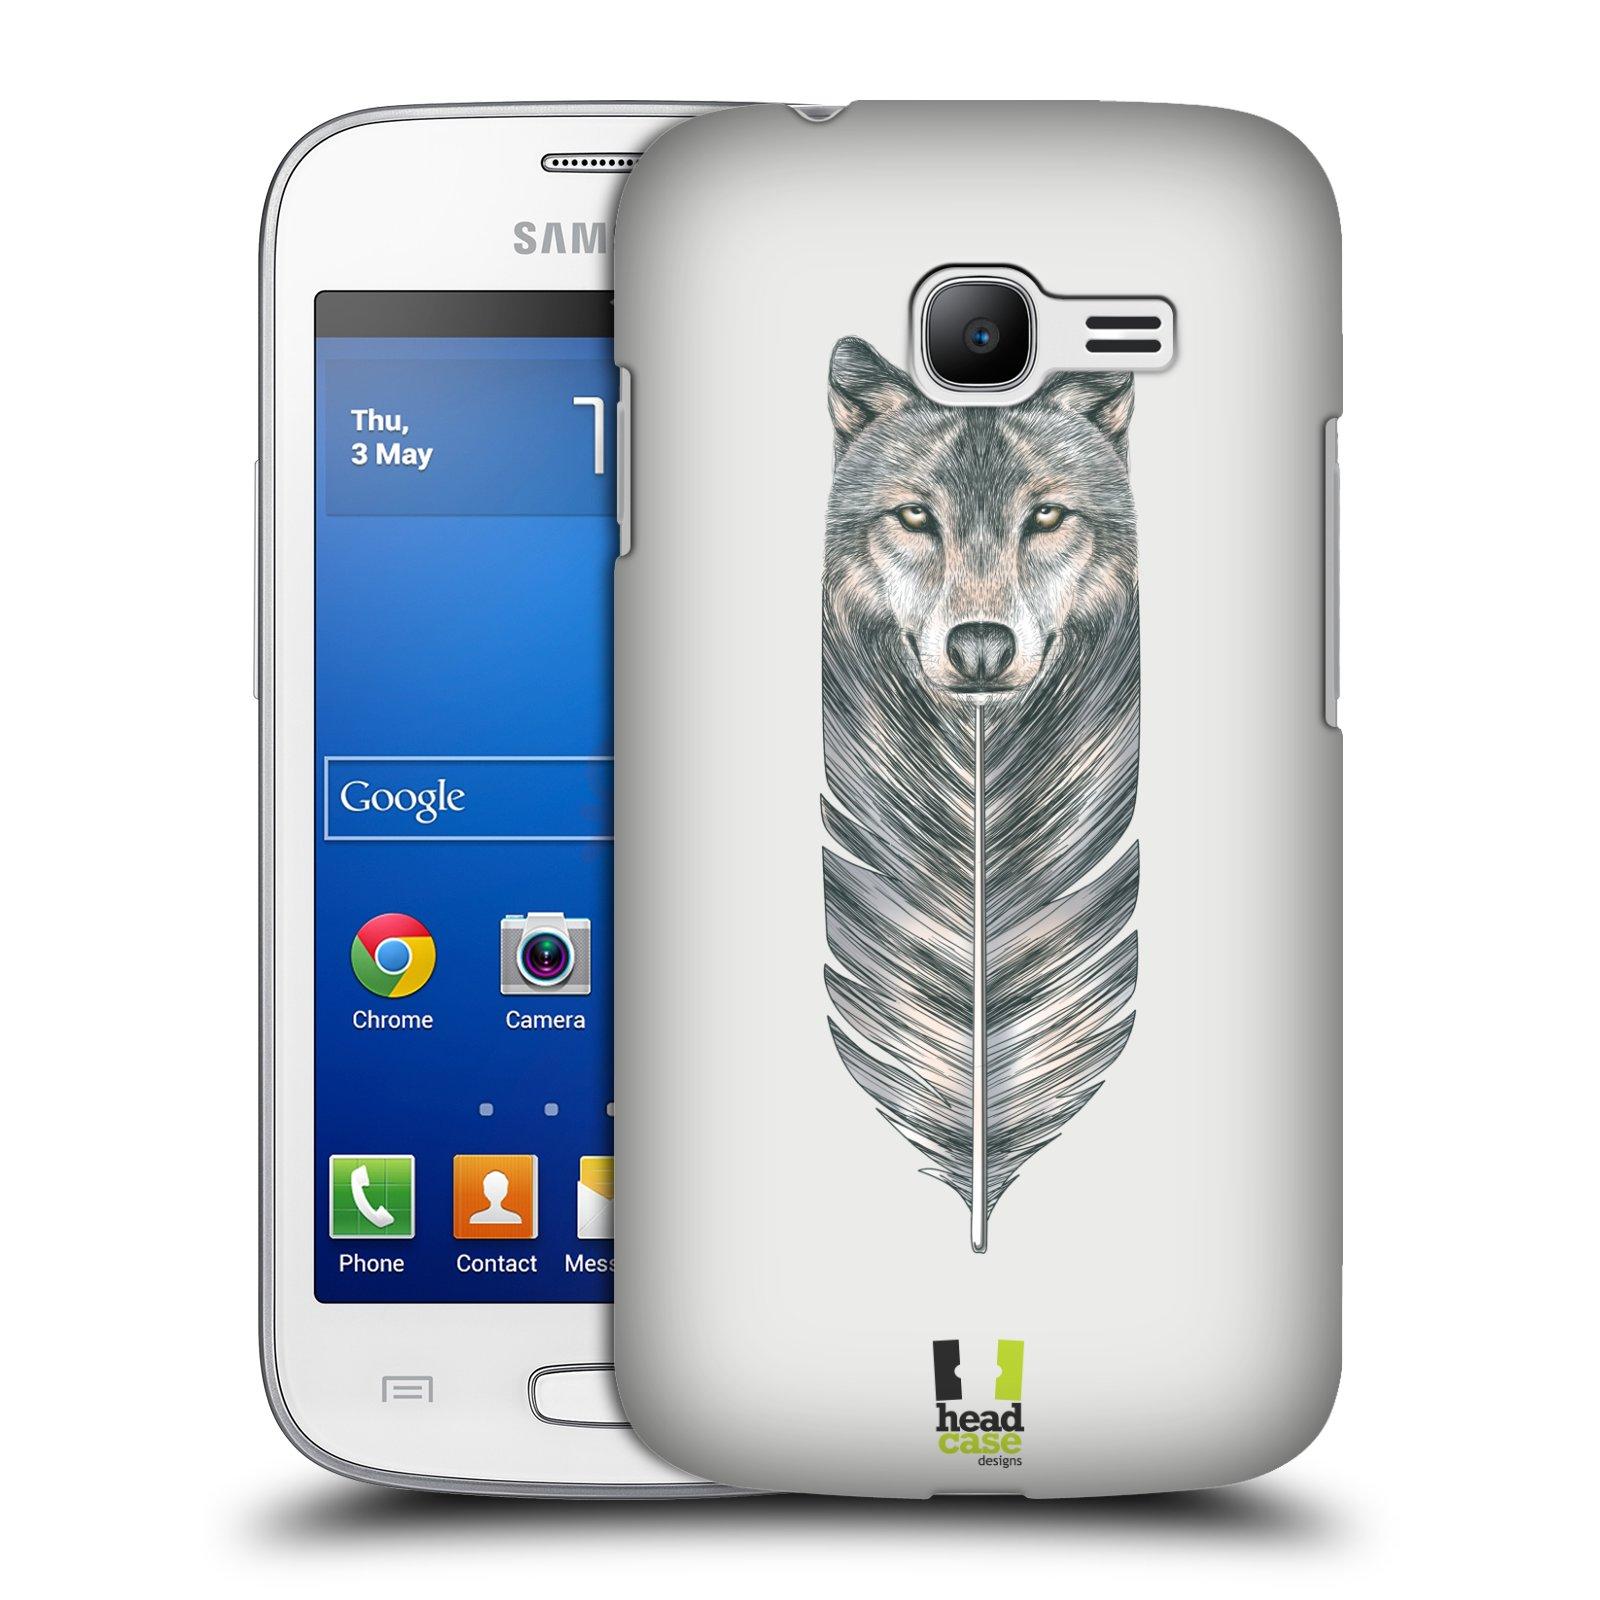 HEAD CASE plastový obal na mobil SAMSUNG GALAXY Star Pro S7260/S7262 DUOS vzor zvířecí pírka vlk